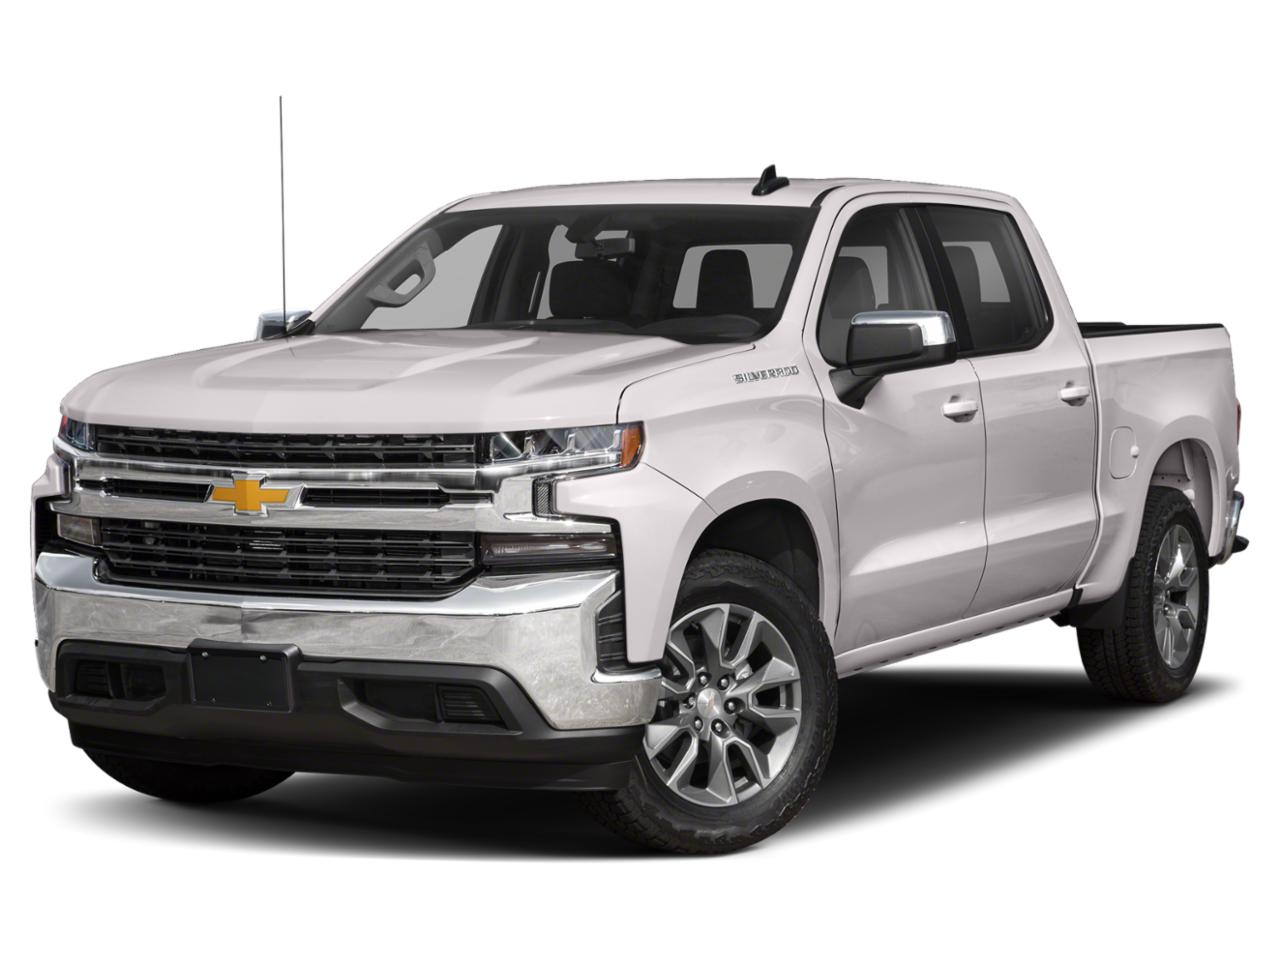 2019 Chevrolet Silverado 1500 Vehicle Photo in TERRYVILLE, CT 06786-5904